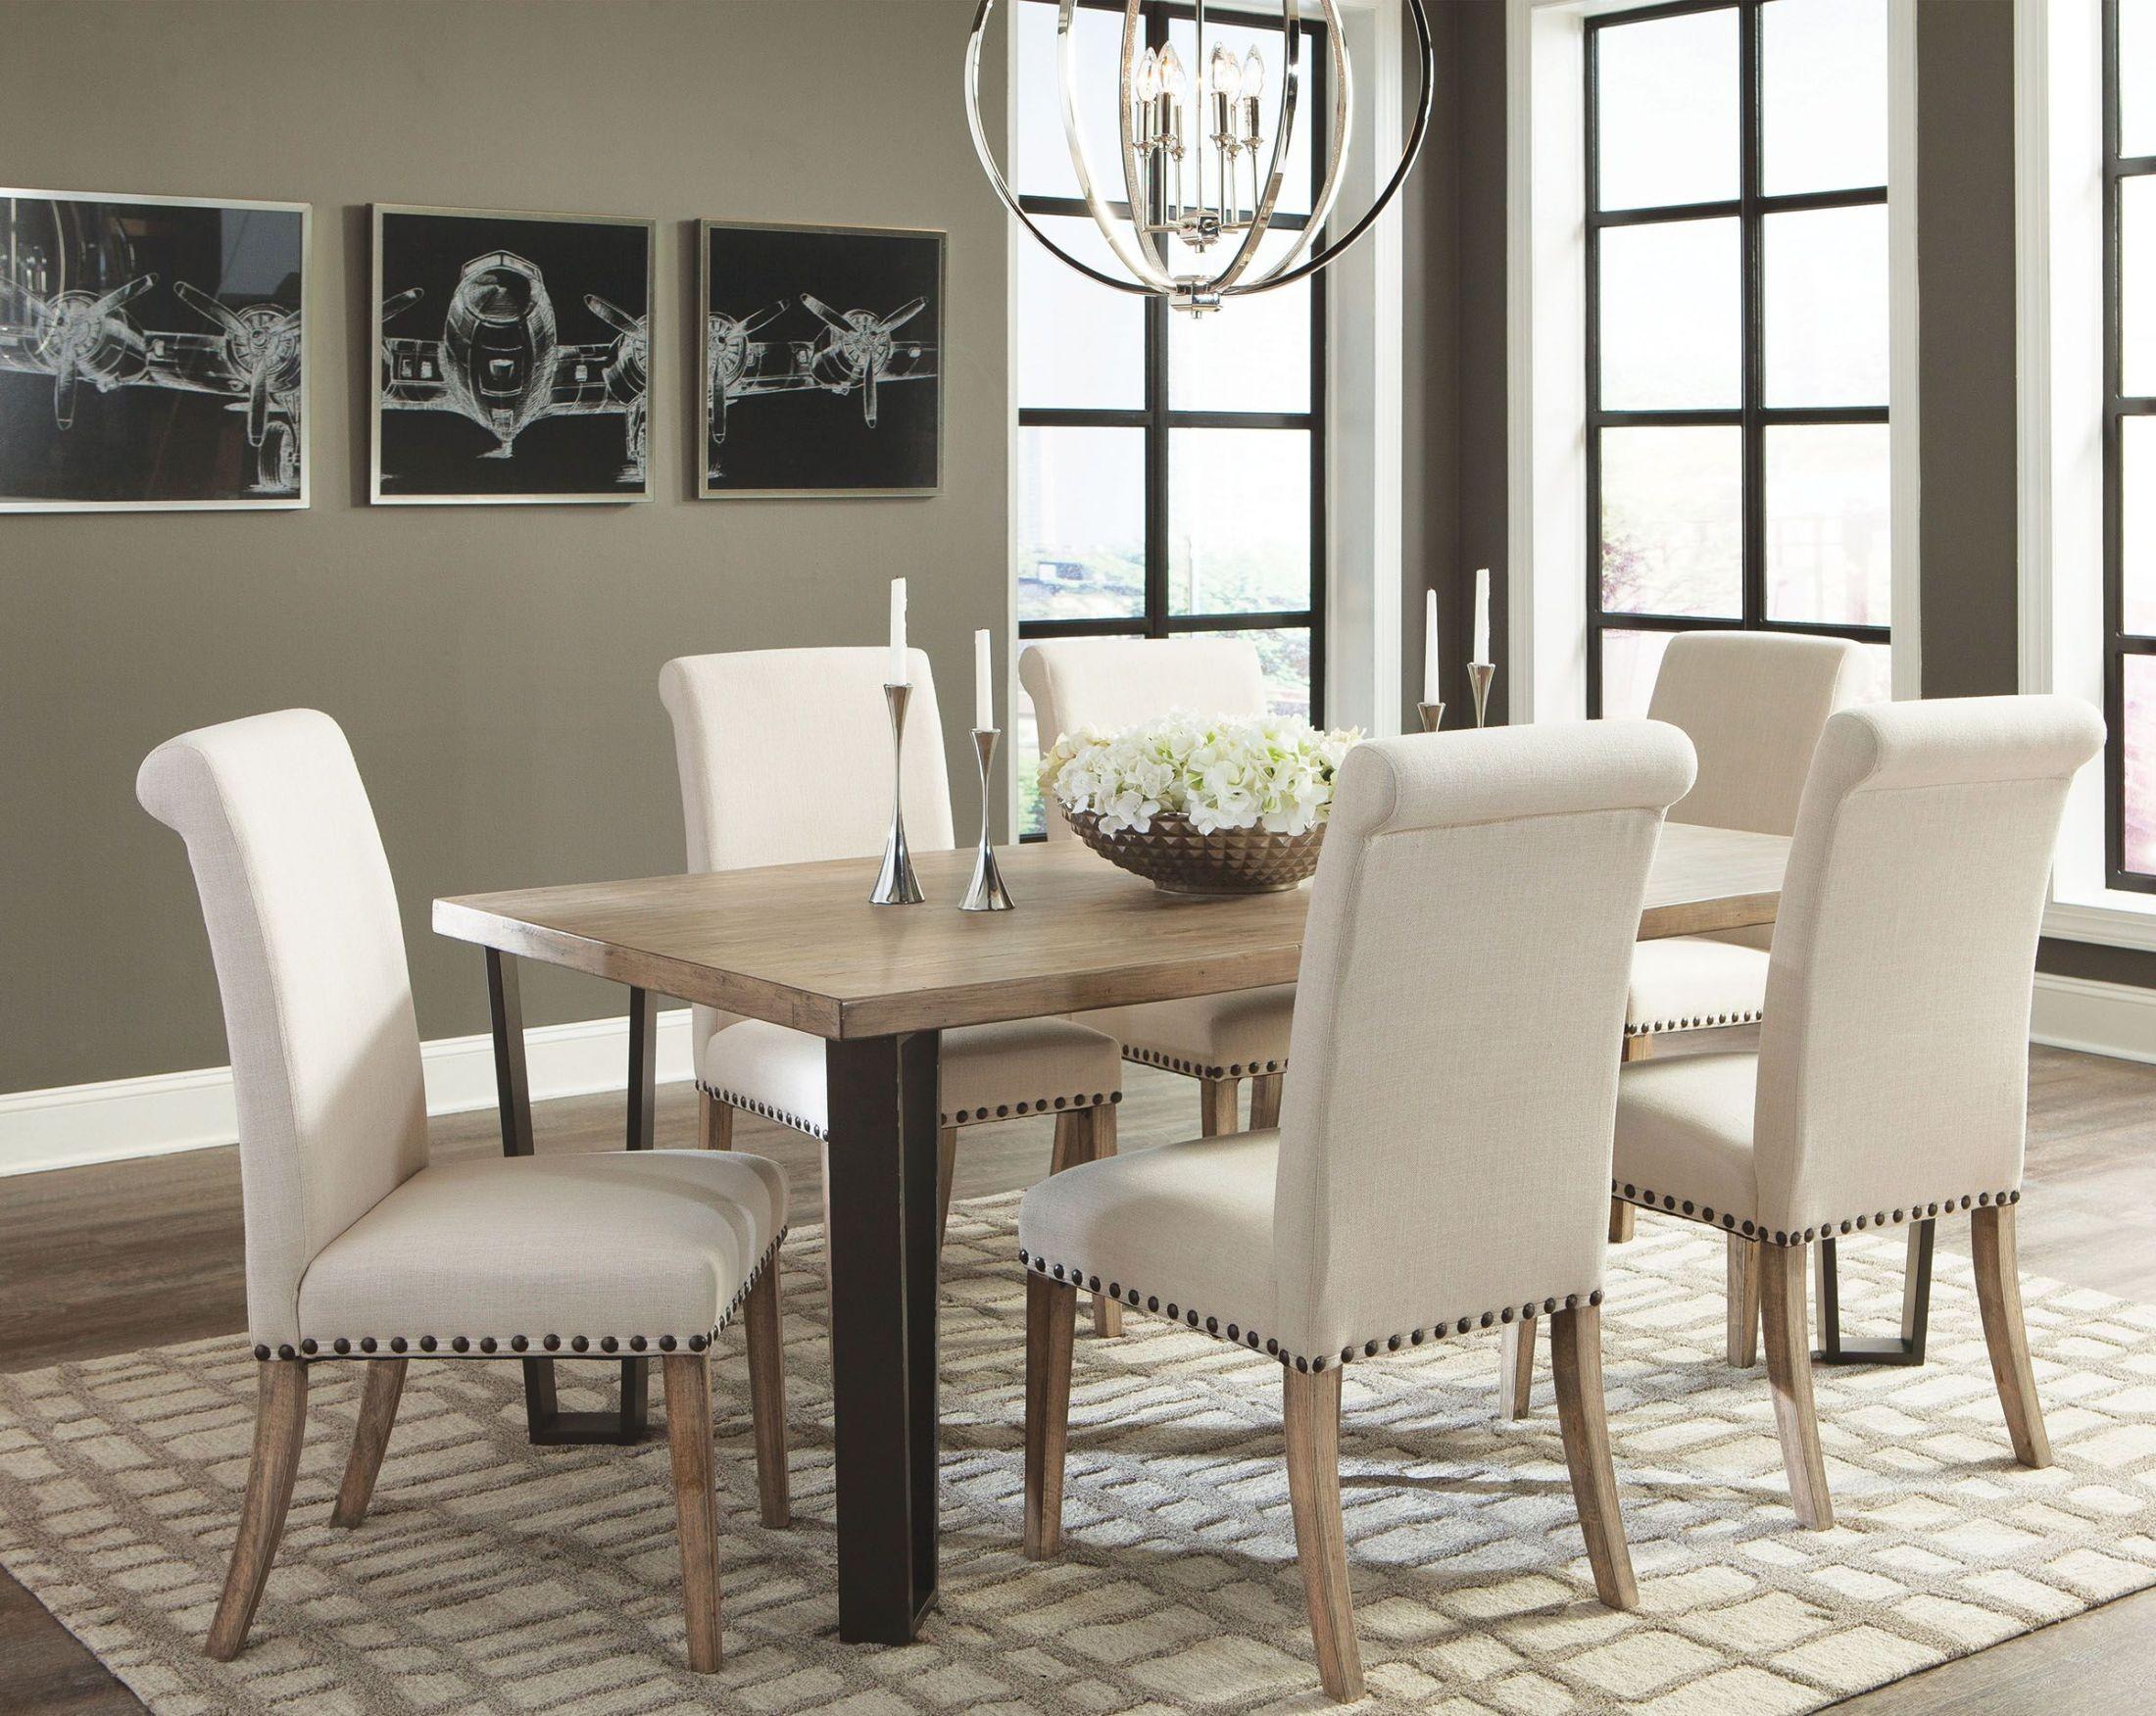 Modern Vintage Rustic Pine Dining Room Set 107431 Coaster Furniture